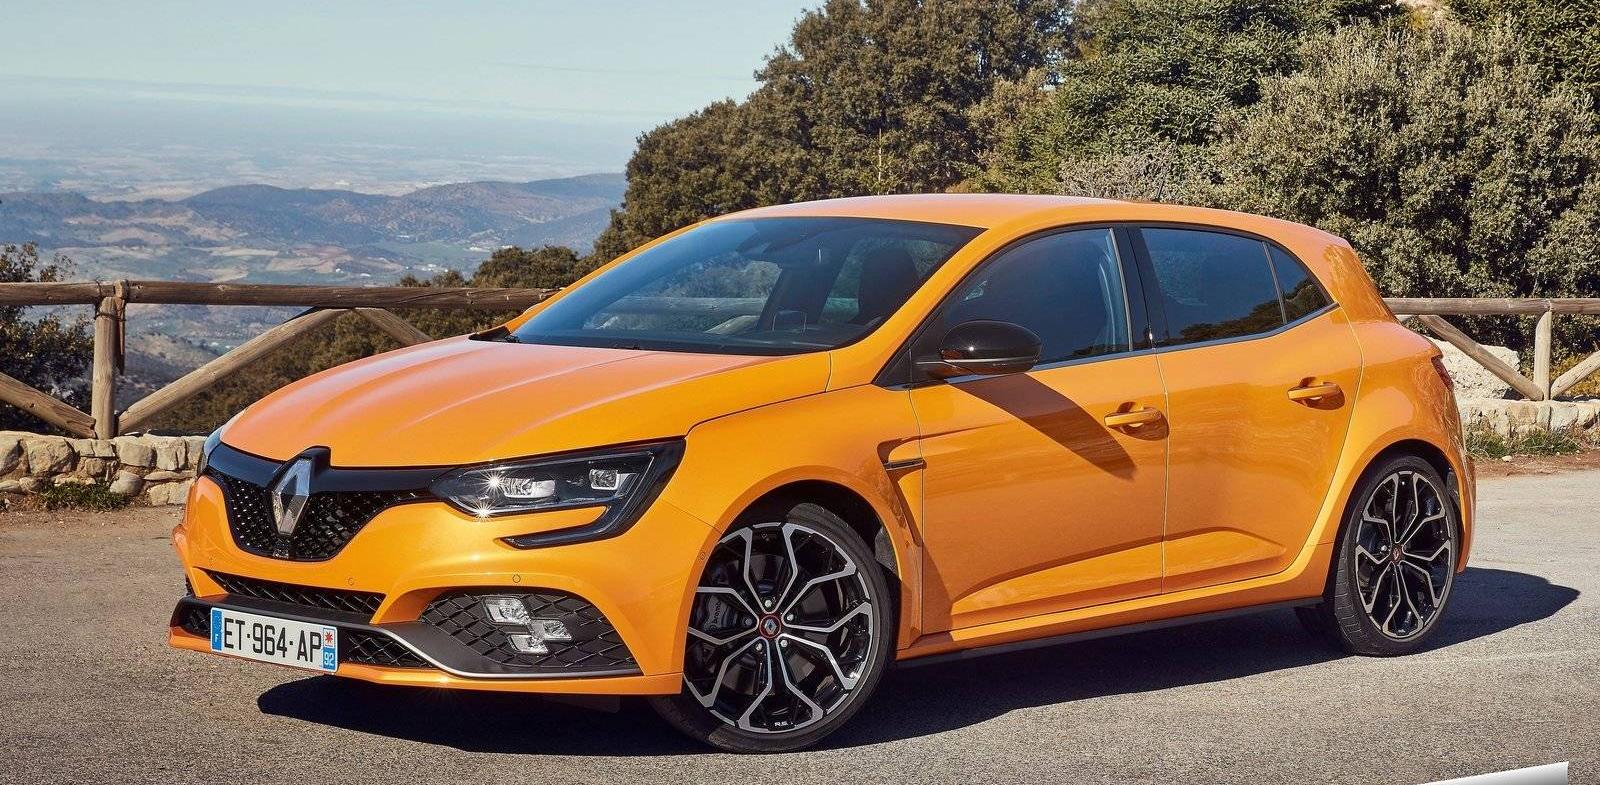 Renault-Megane_RS-2018-1600-0d.jpg